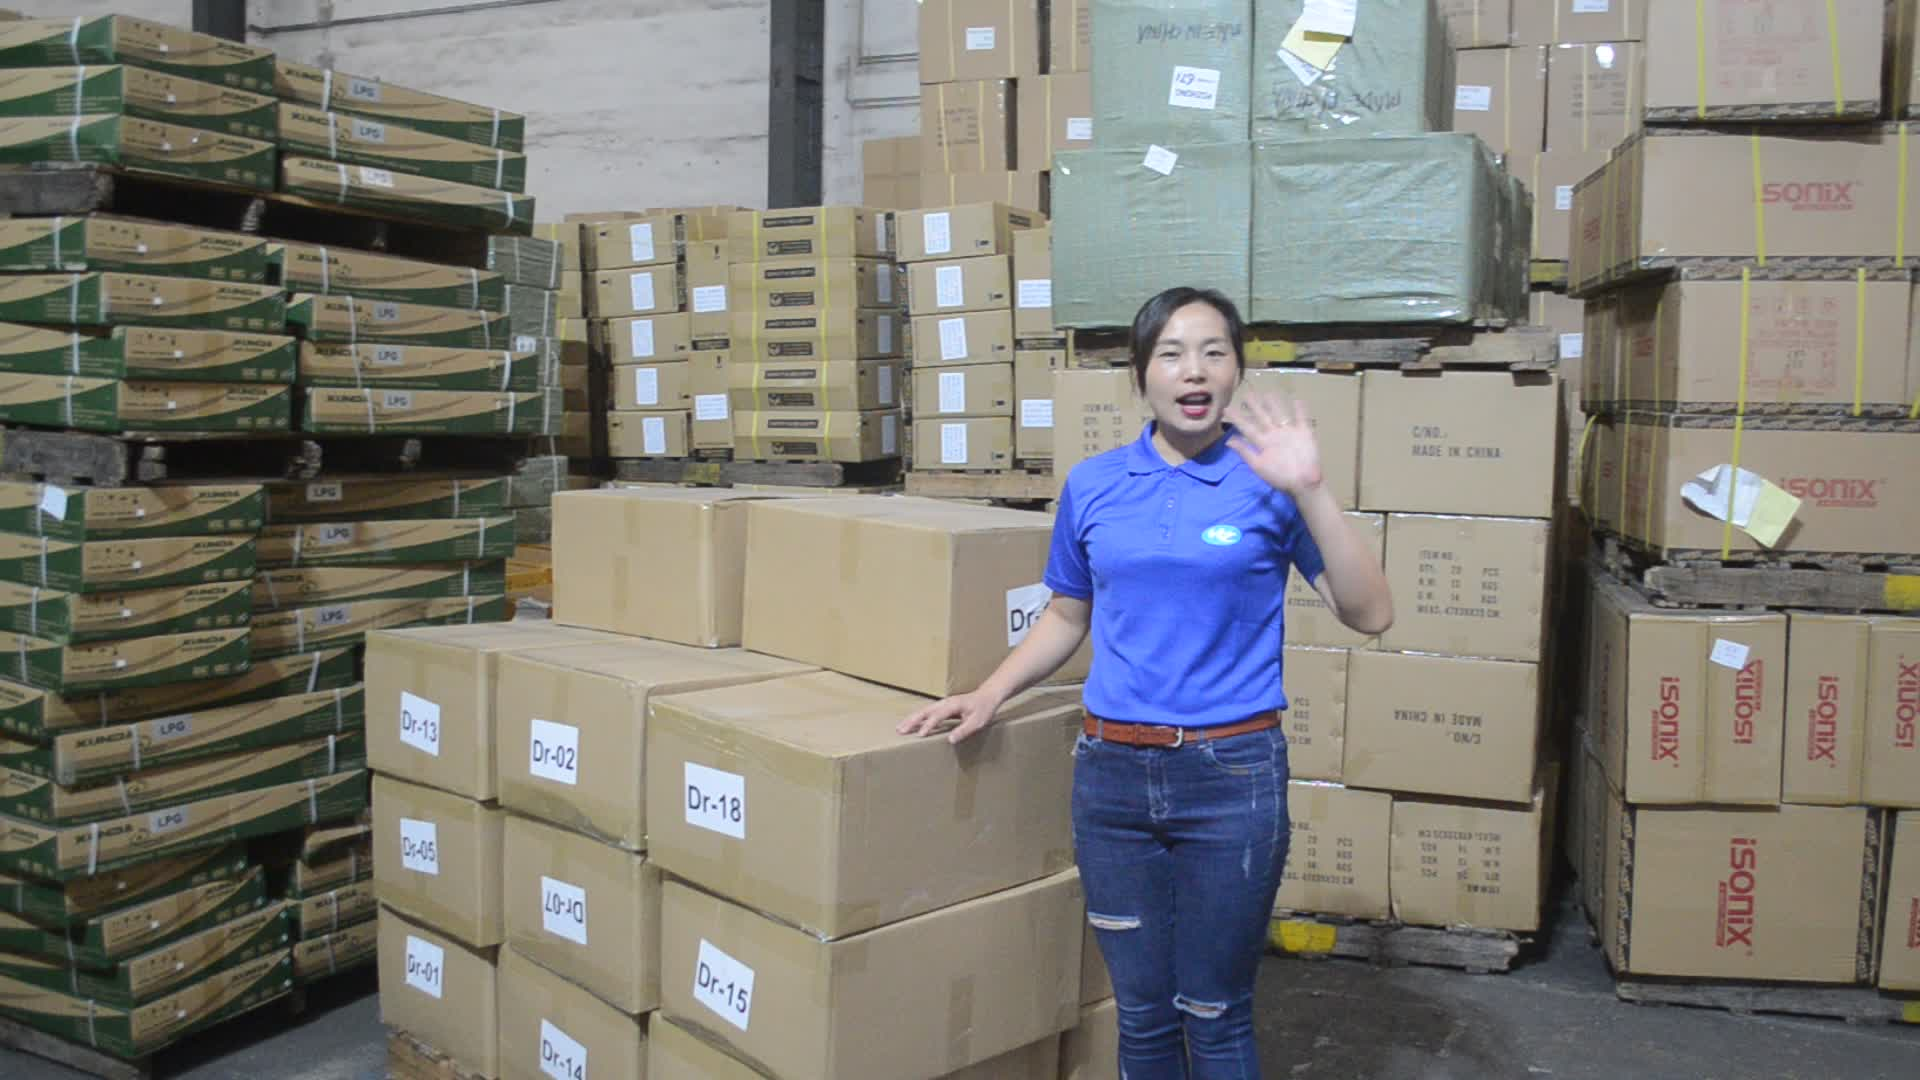 International sea freight 20GP 40GP 40HQ การจัดส่งแพคเกจกระเป๋าจากประเทศจีนเวียดนาม